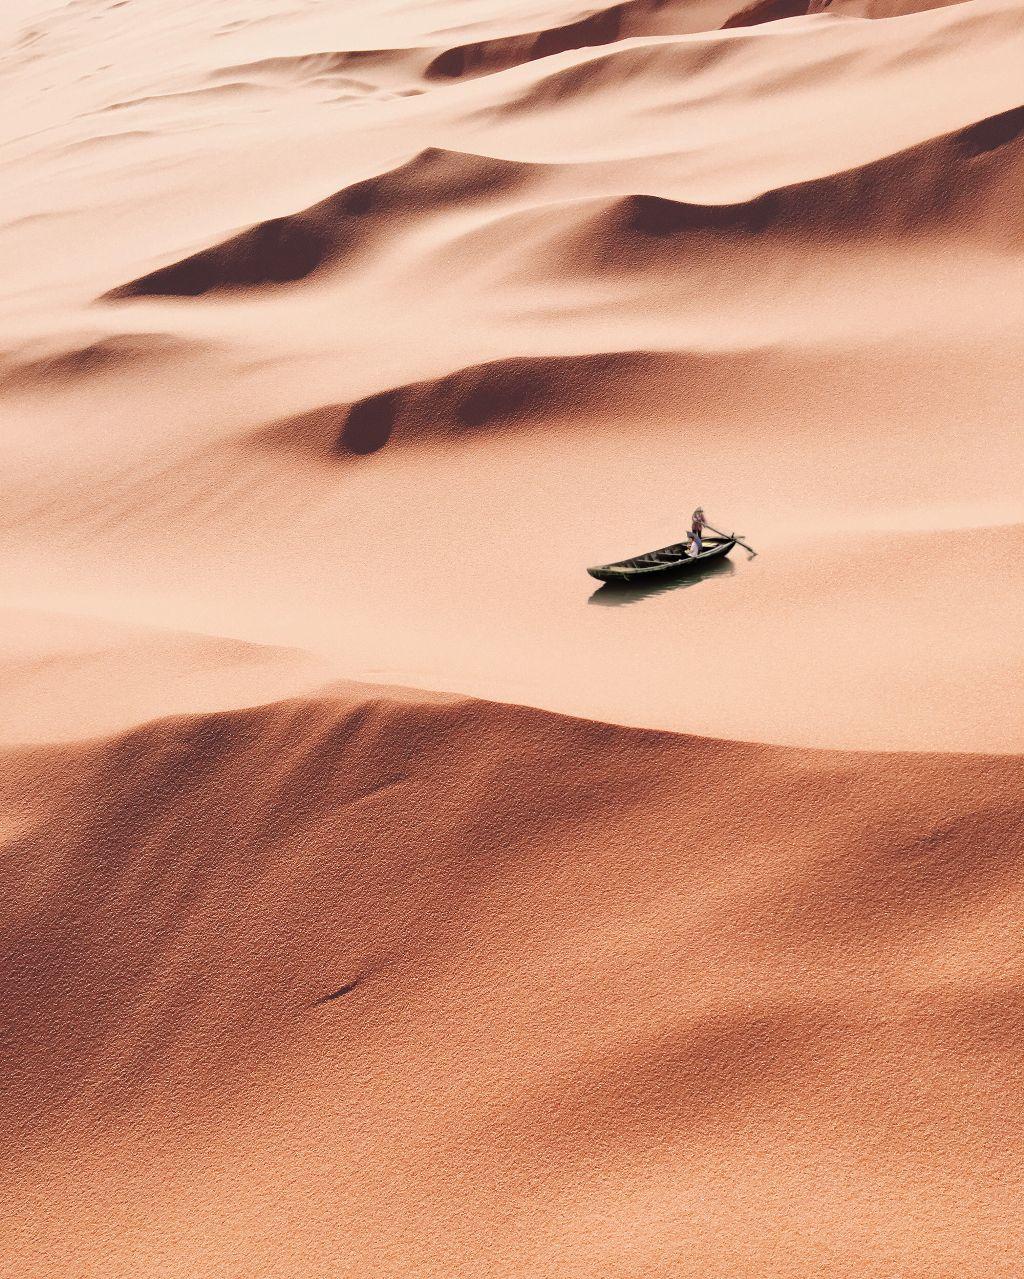 Waves .. . . . . . .. #interesting #aesthetic #surreal #drama #boat #desert #edited #freetoedit #beach #interesting #people #travel #sea